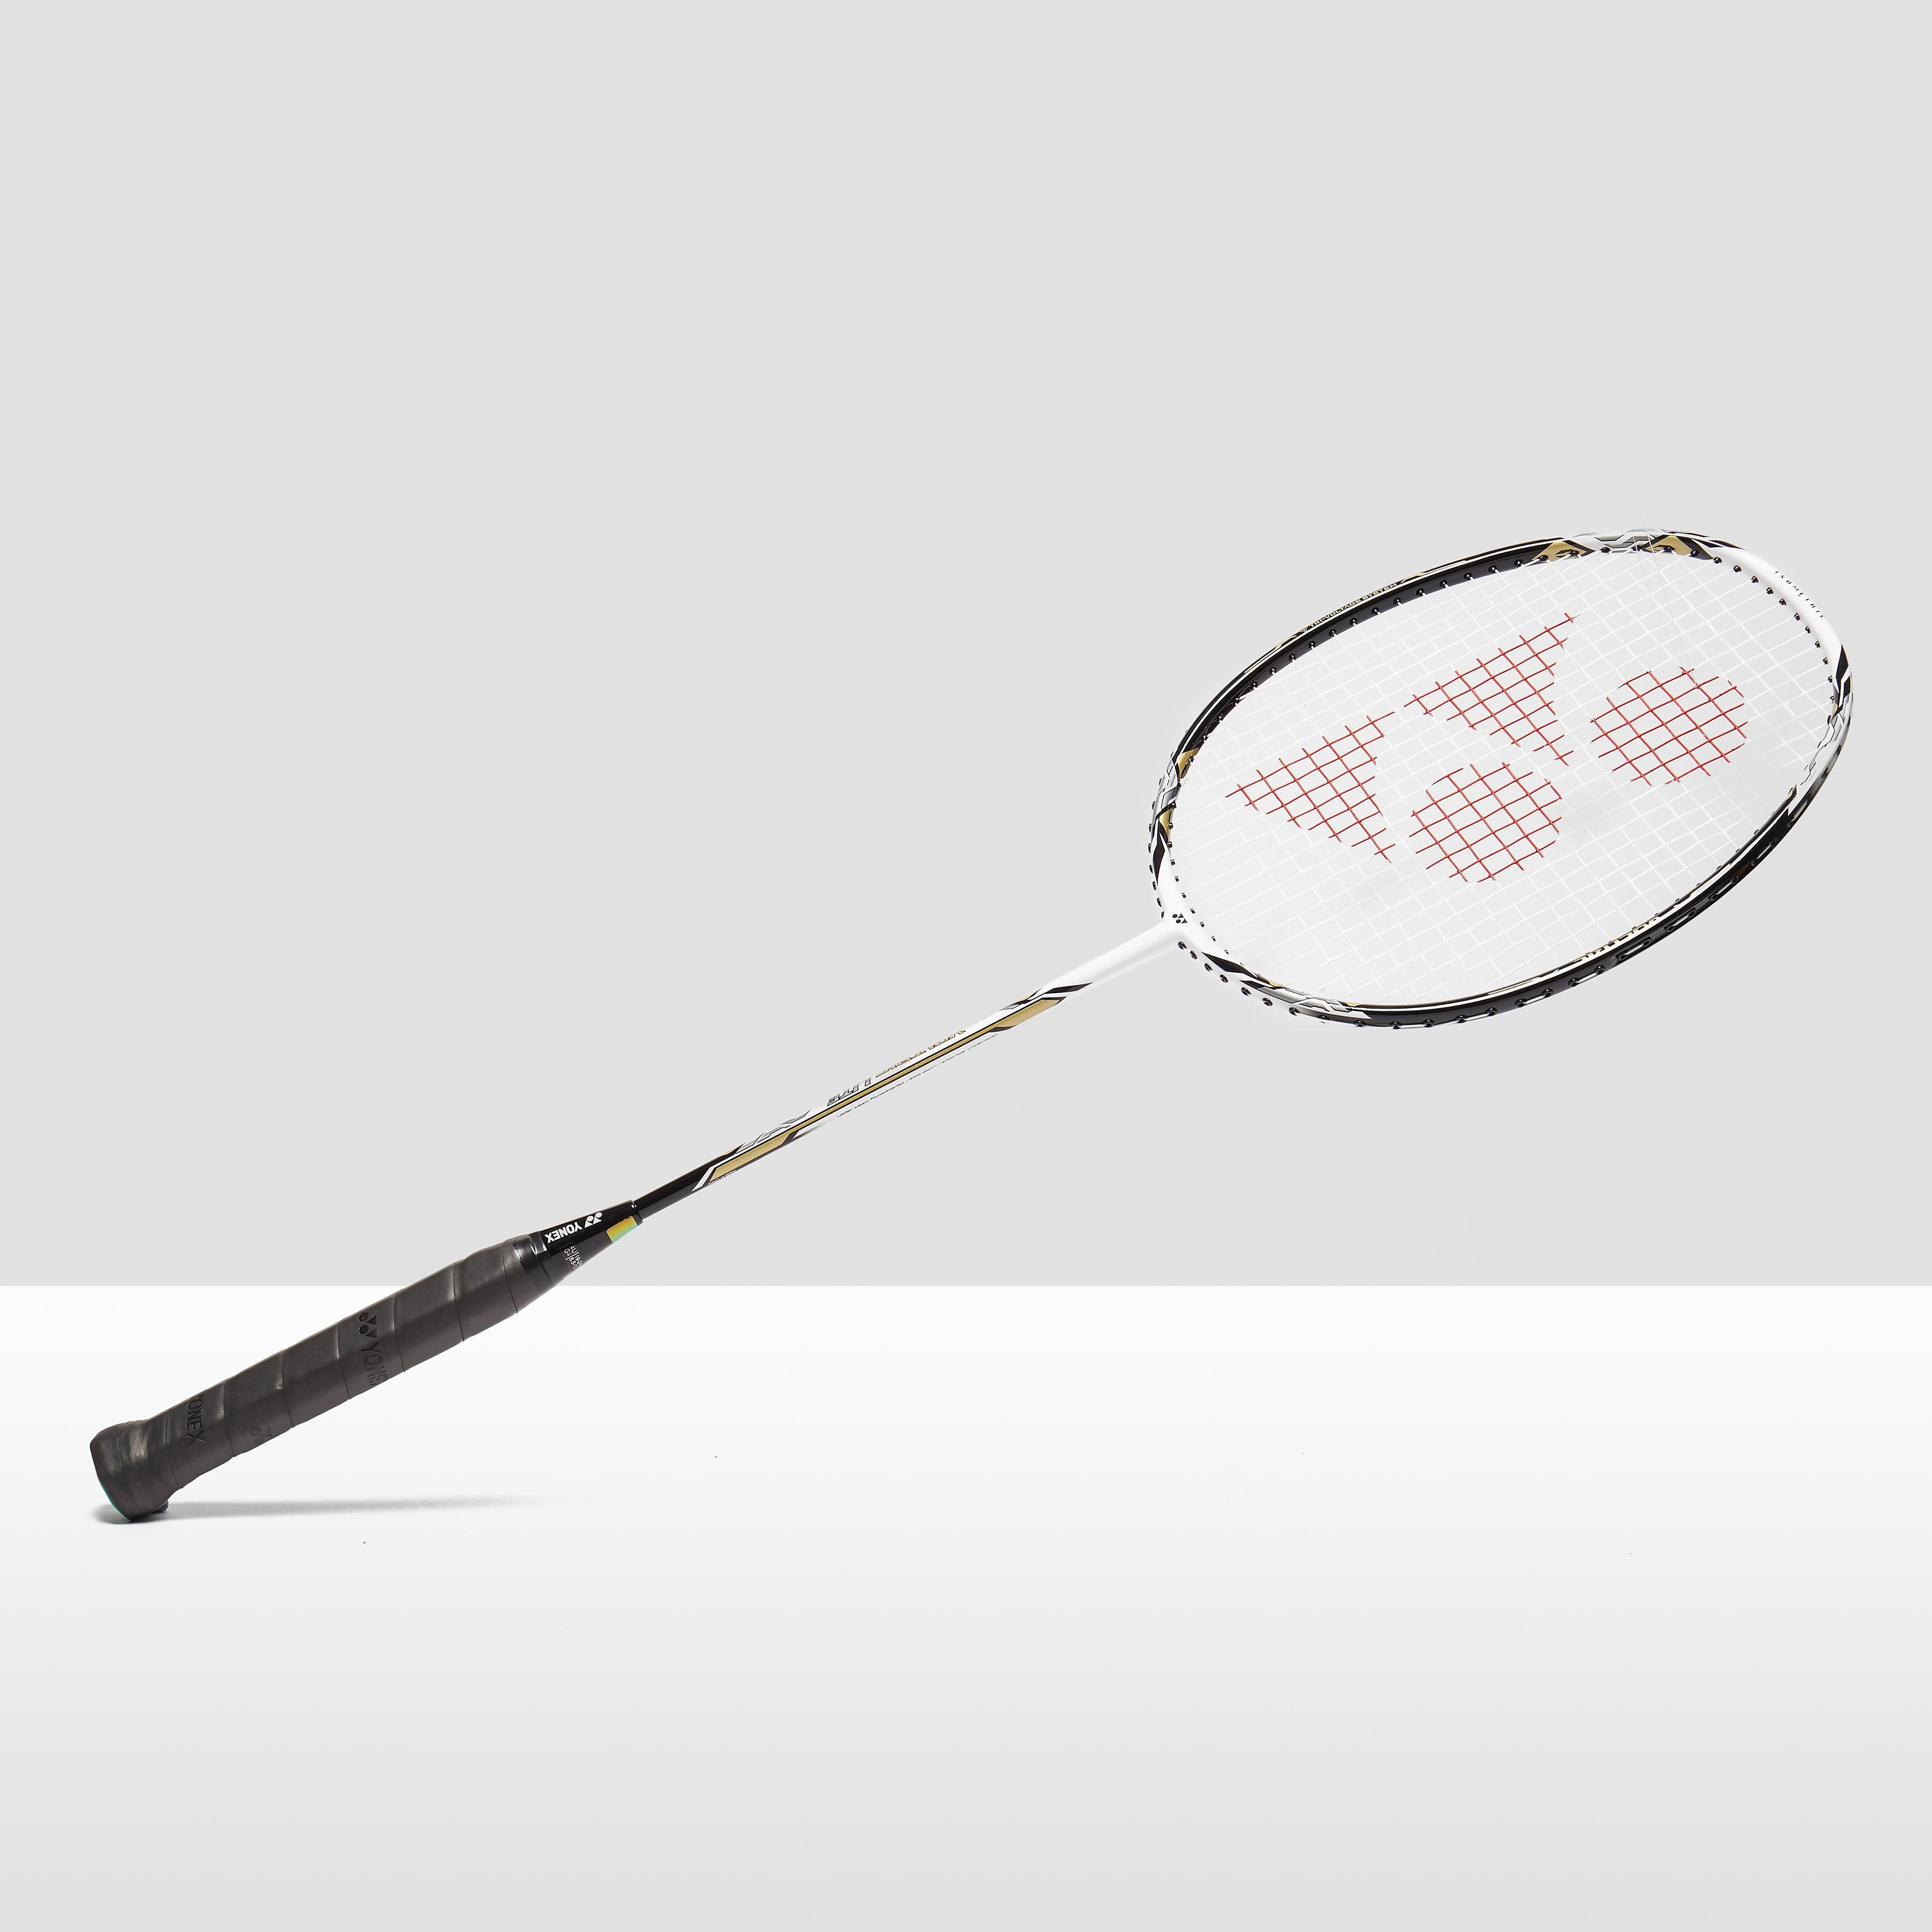 Yonex VT Lite Badminton Racket